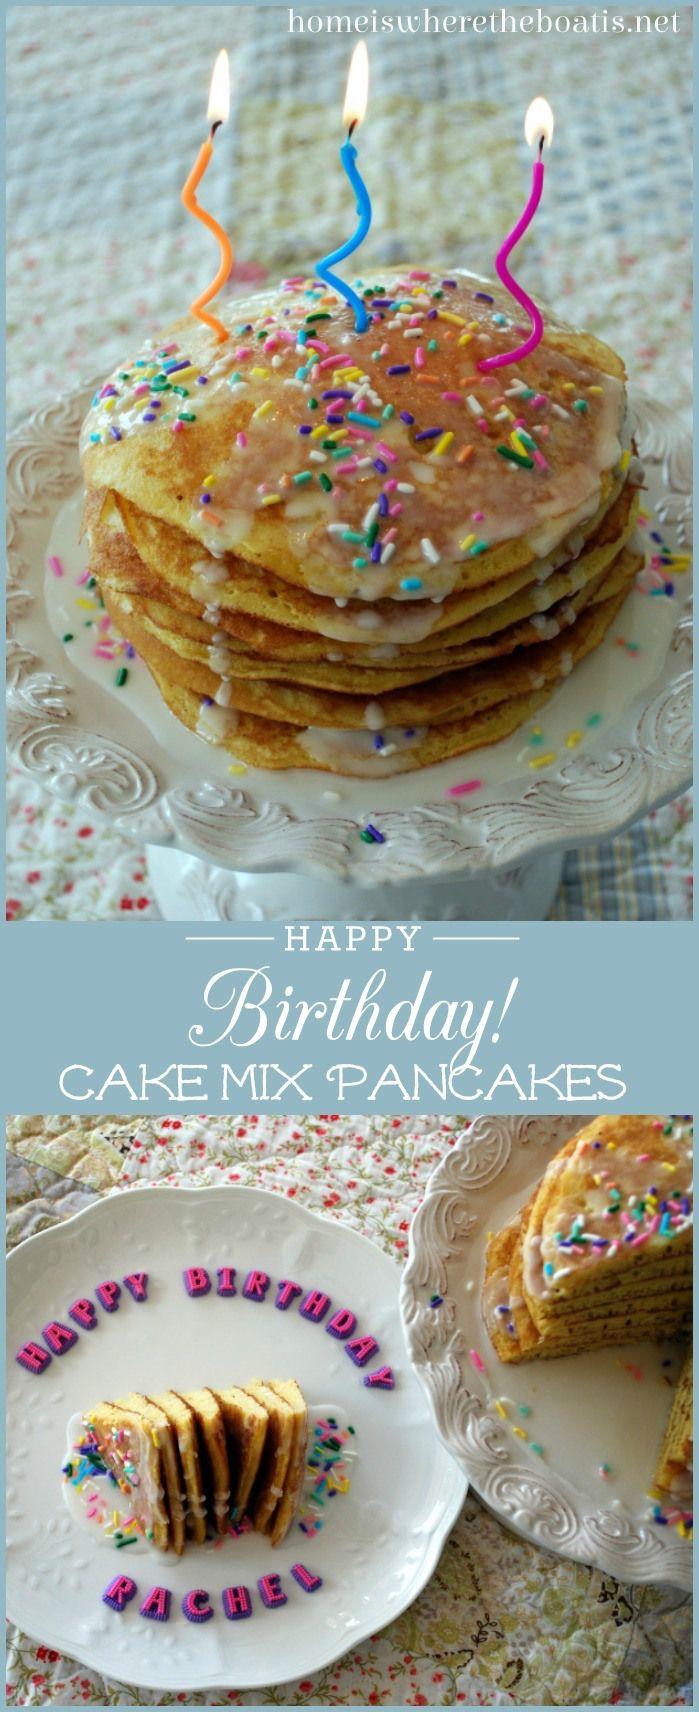 Happy Birthday Cake Mix Pancakes Food Pinterest Cake mix